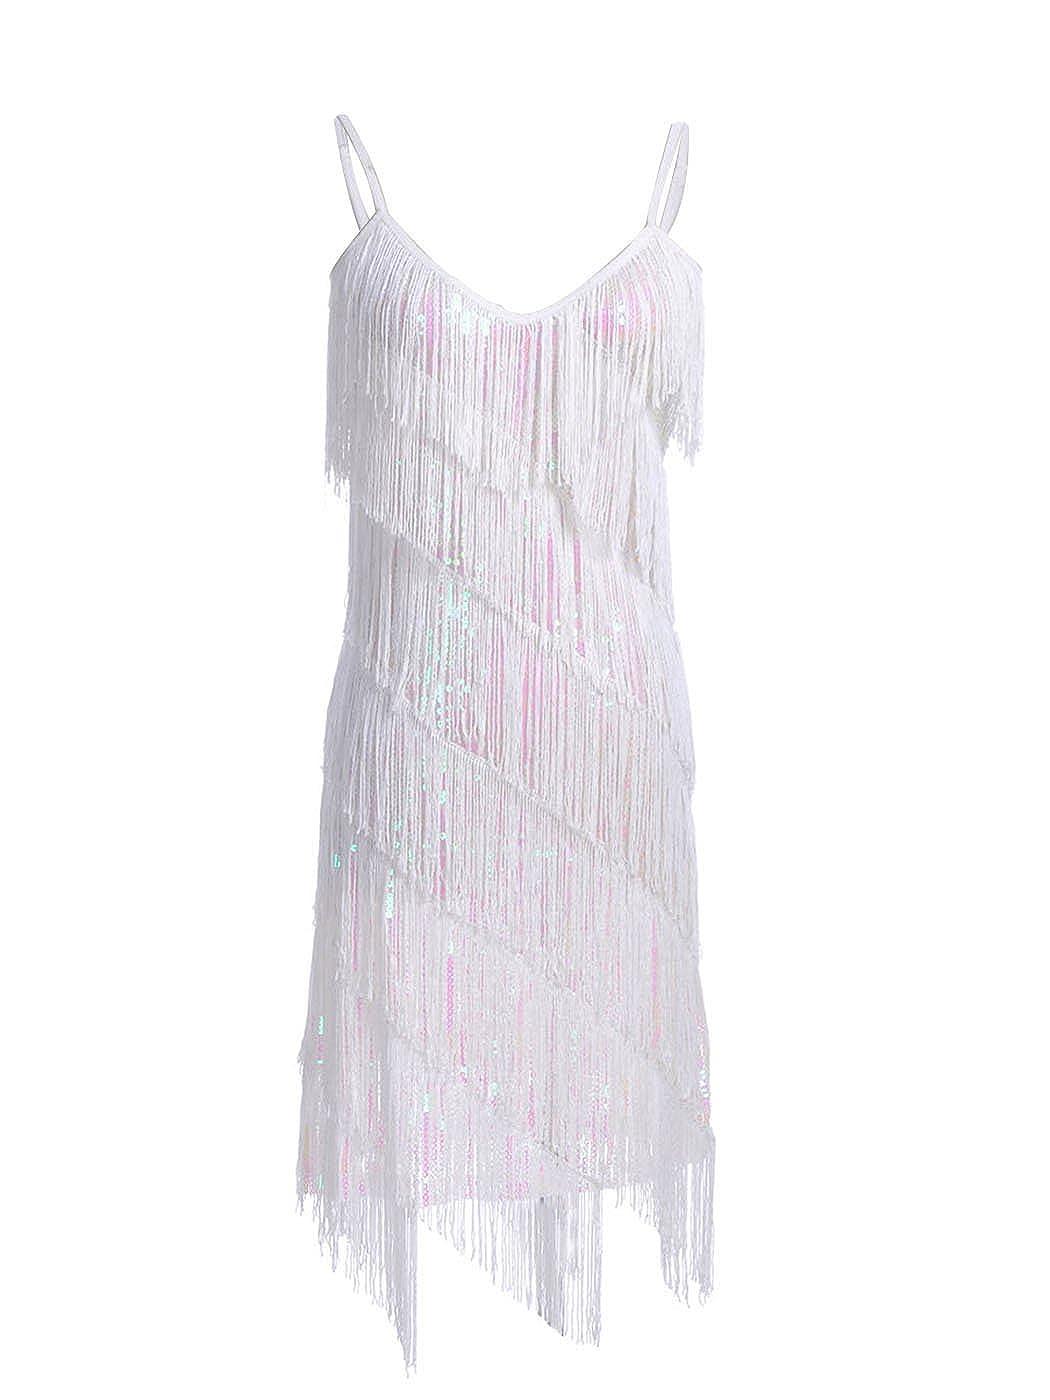 White AnnaKaci Womens Fringe Sequin Strap Backless 1920s Flapper Party Mini Dress